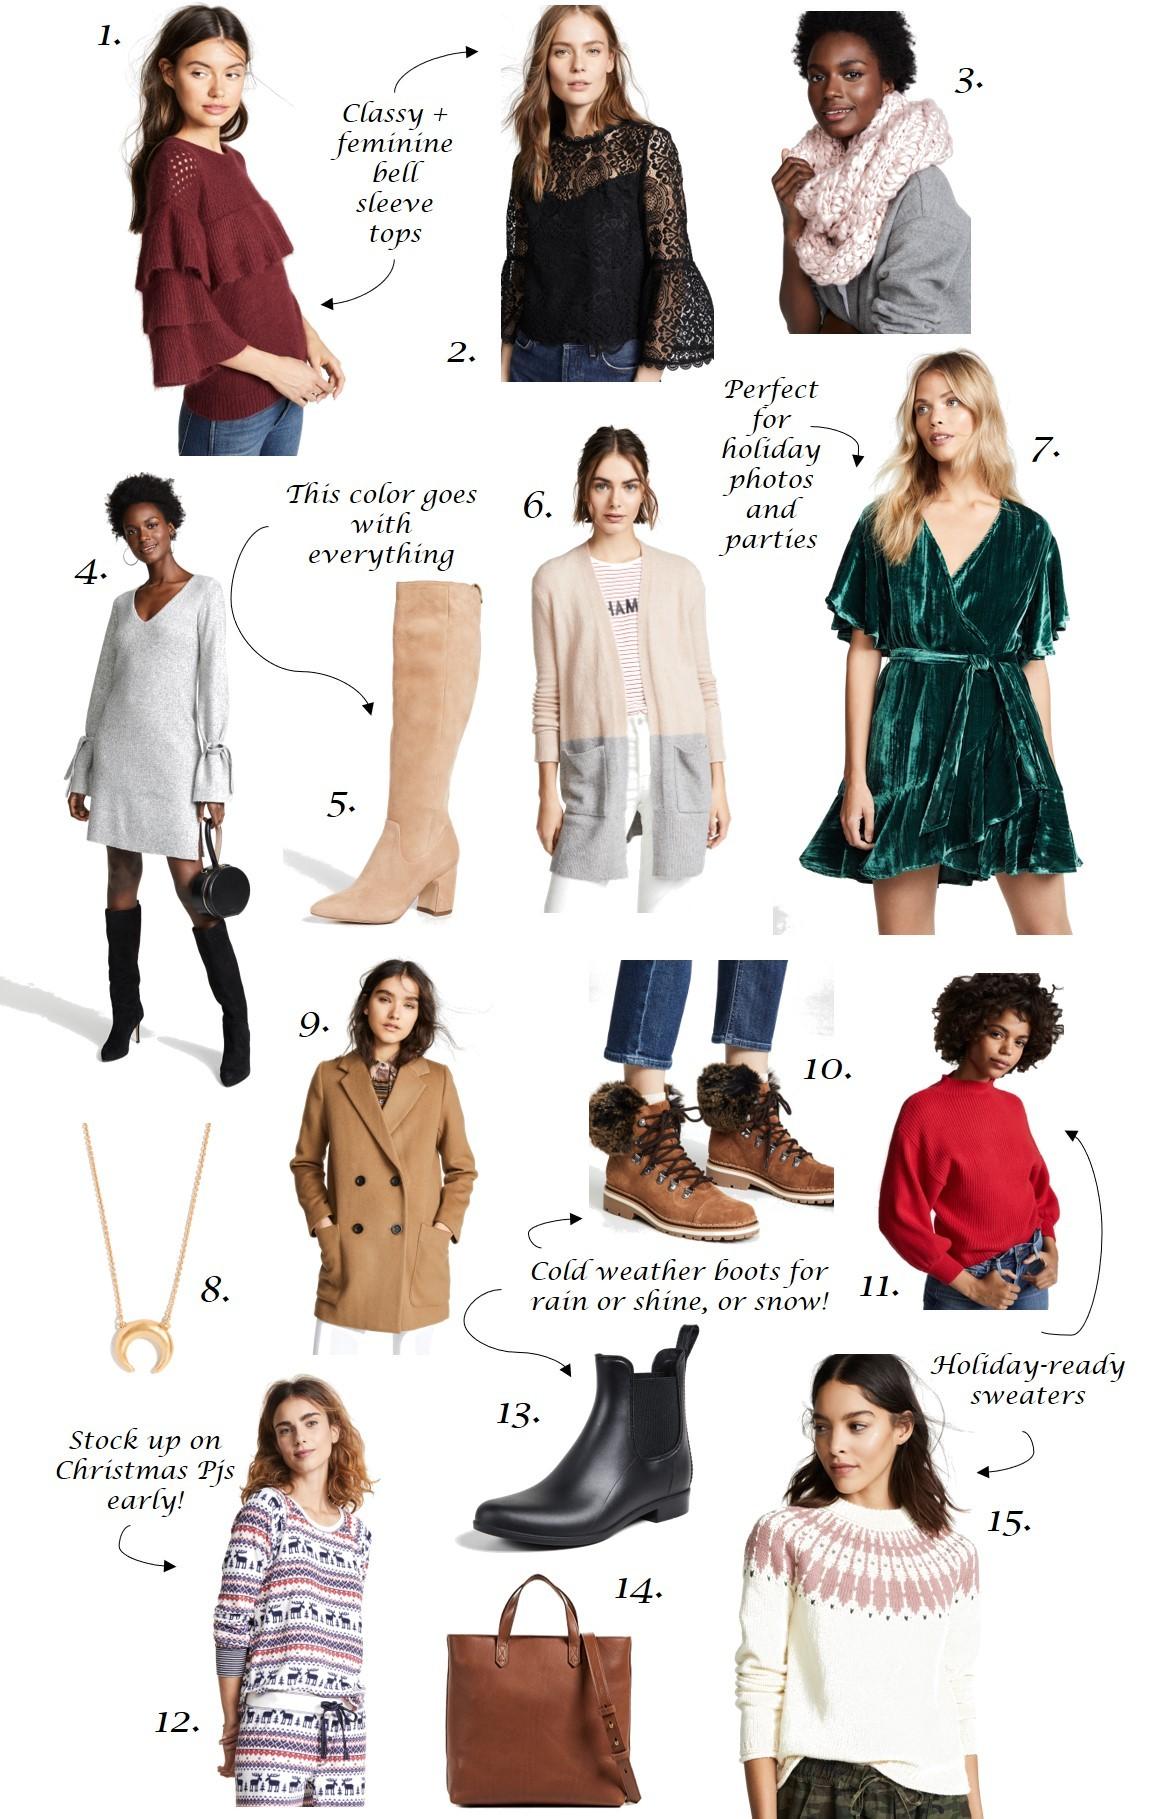 a1c0d40aaeb2 Most Popular Fashion   Home Black Friday + Cyber Monday Sales 2018 ...